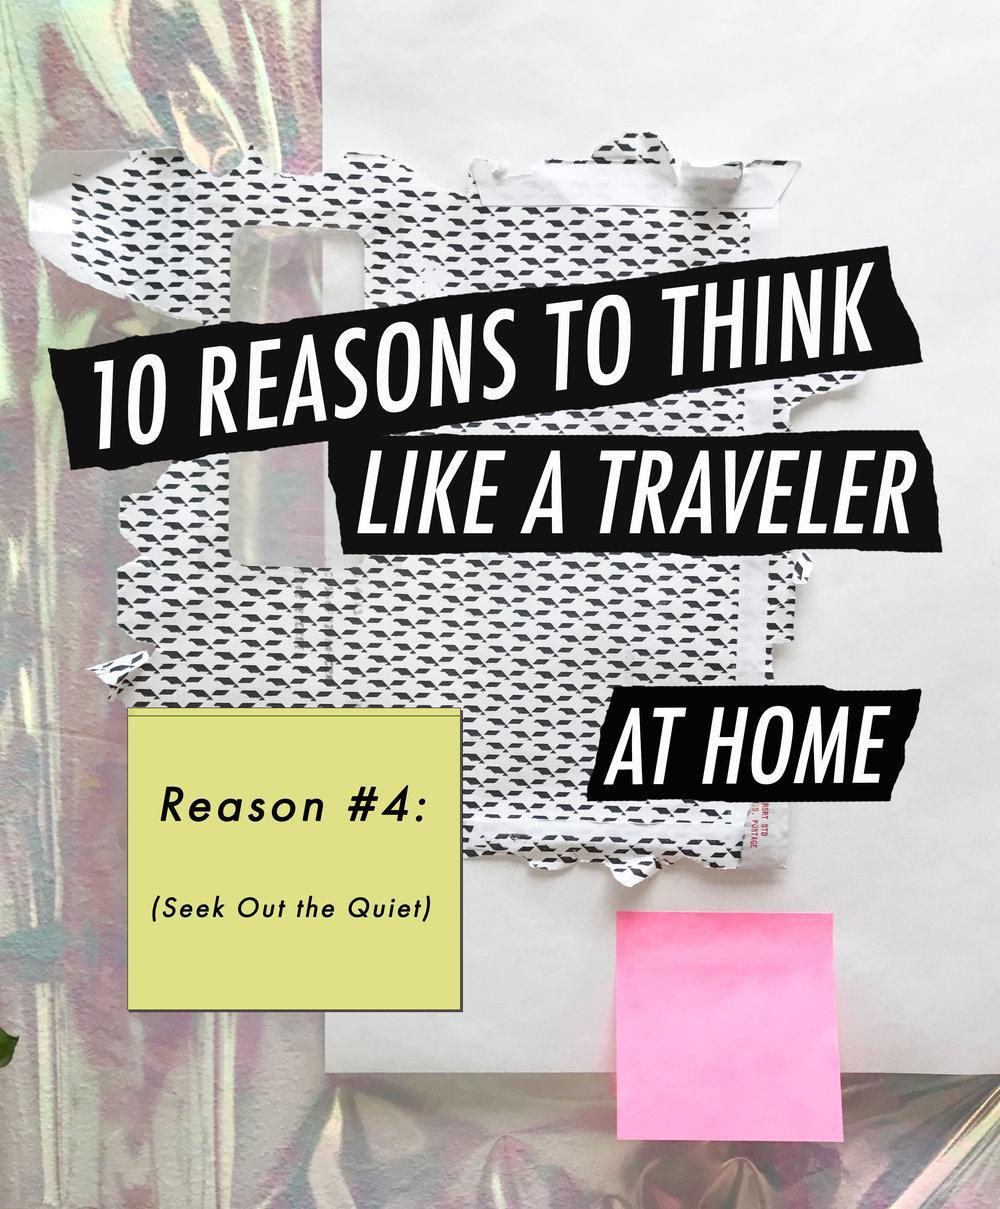 10 Reasons_Reason #4_Local(Tourist)